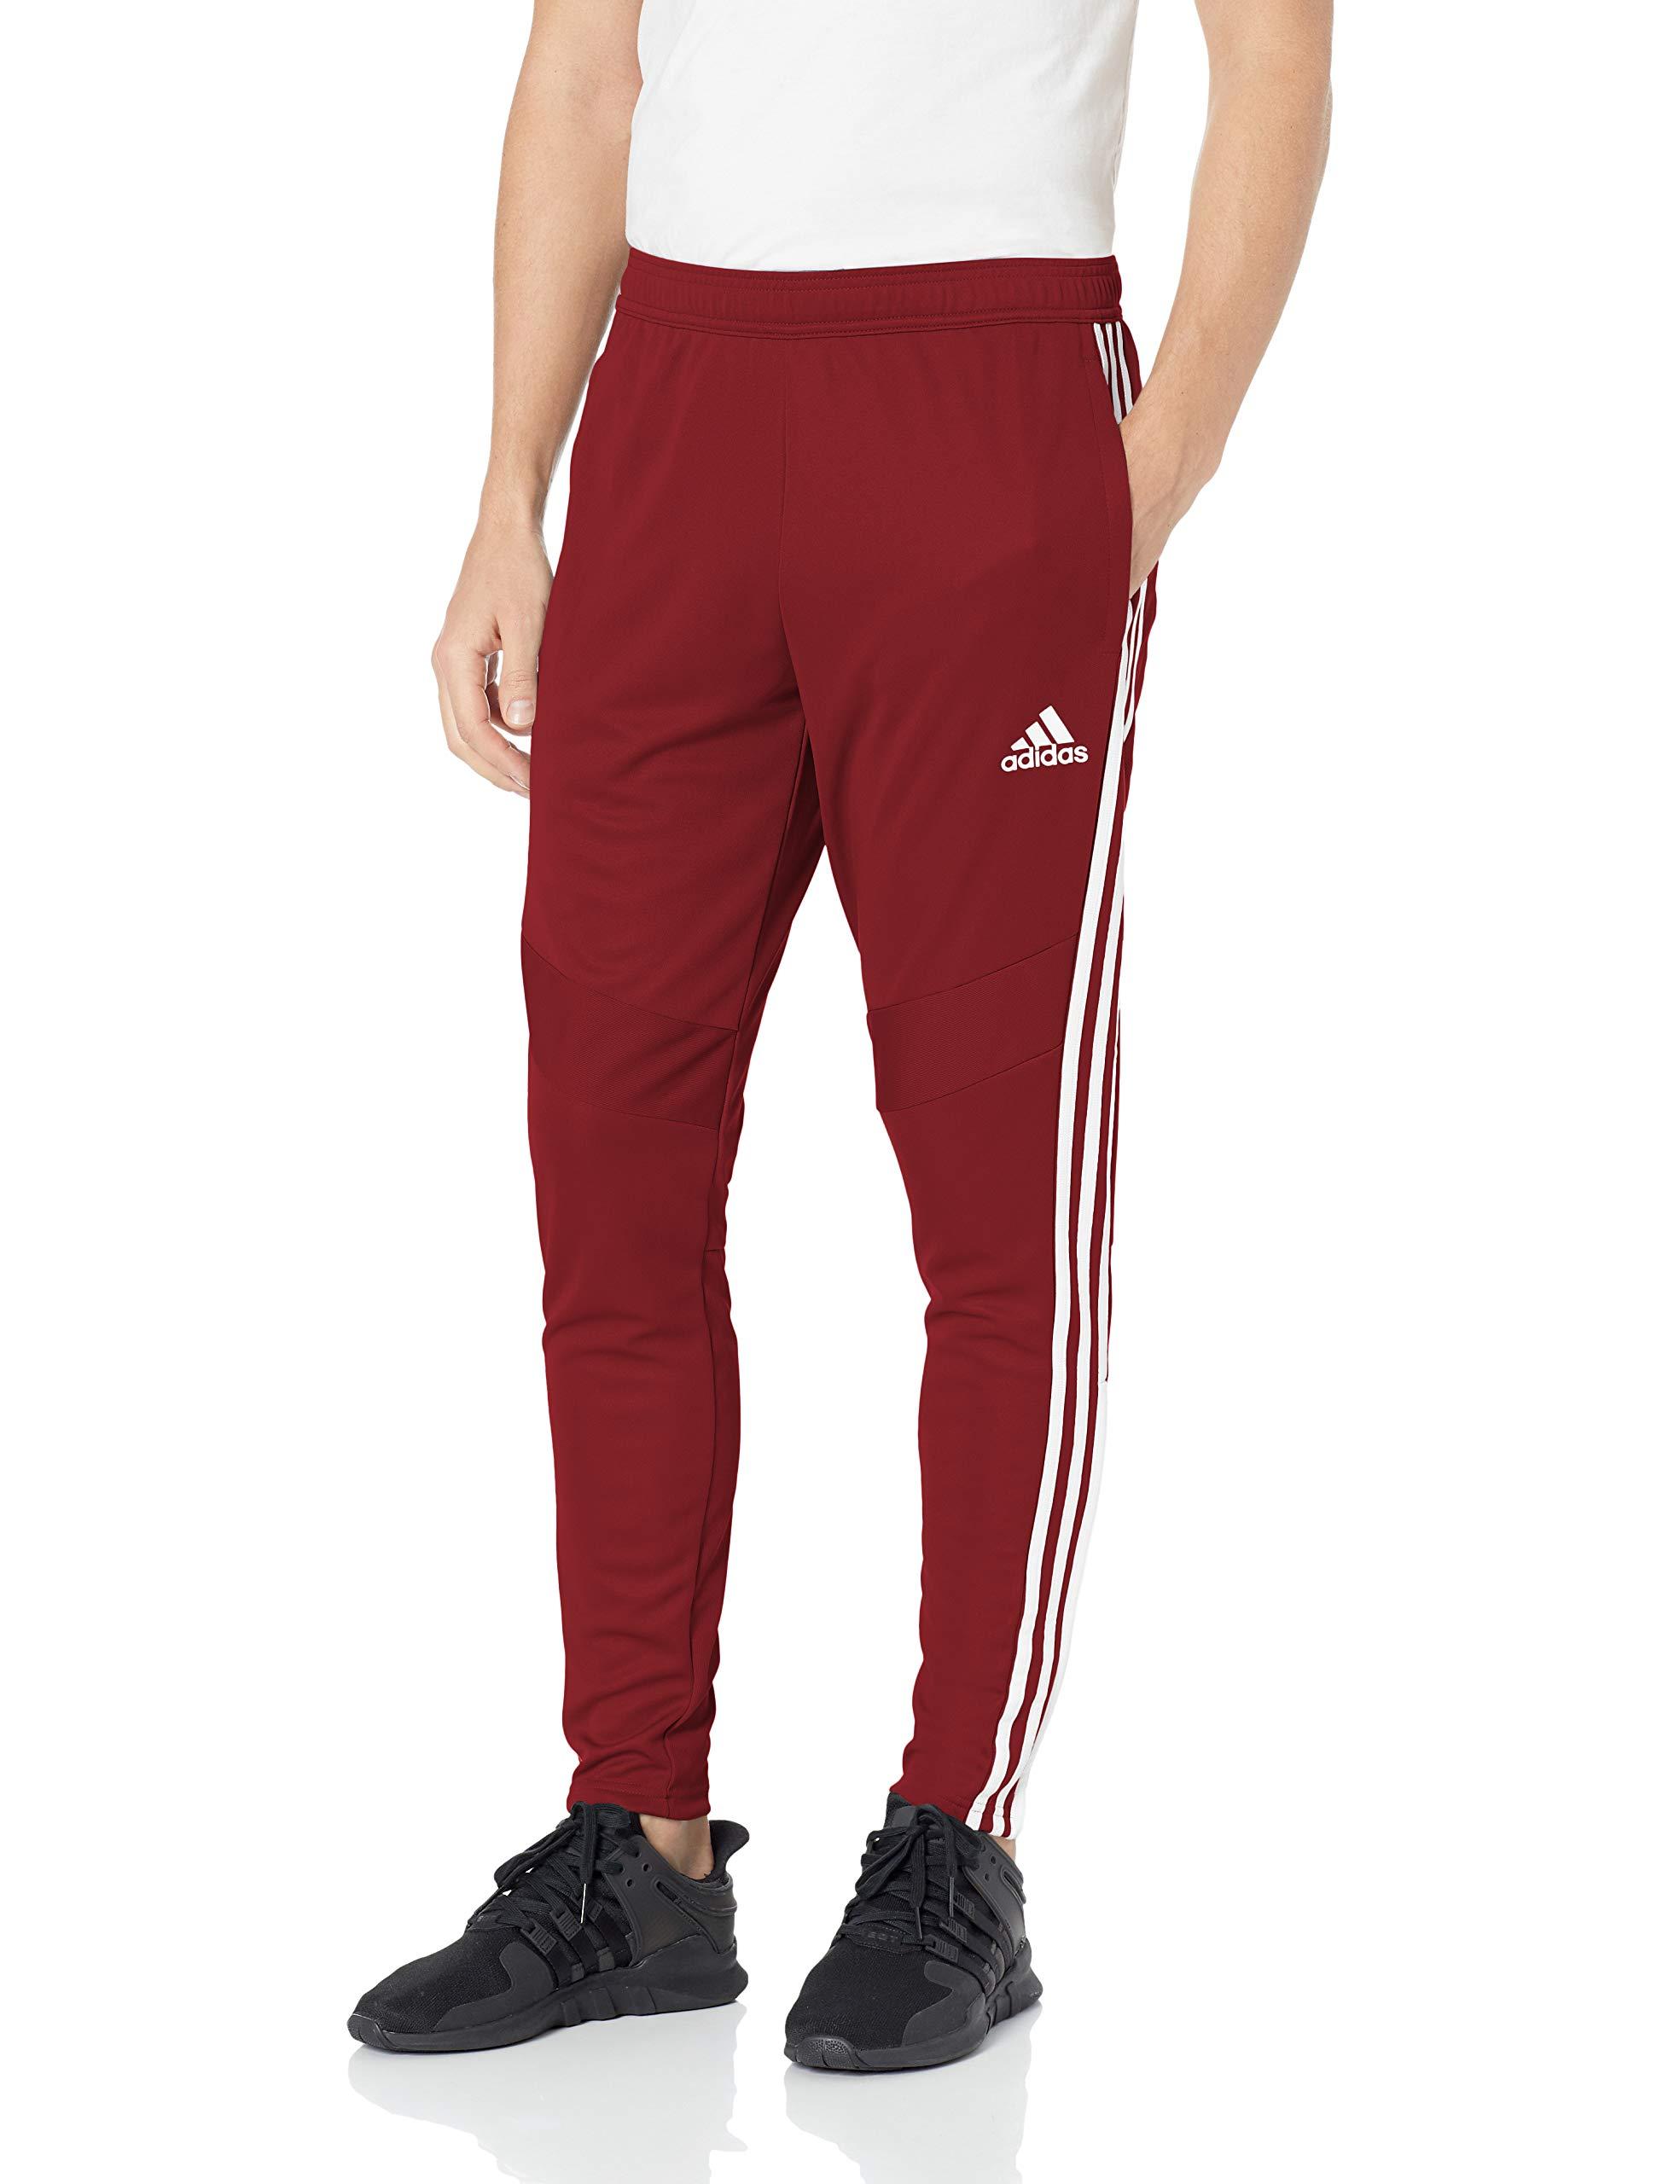 adidas Tiro19 Pant, Red, XX-Large